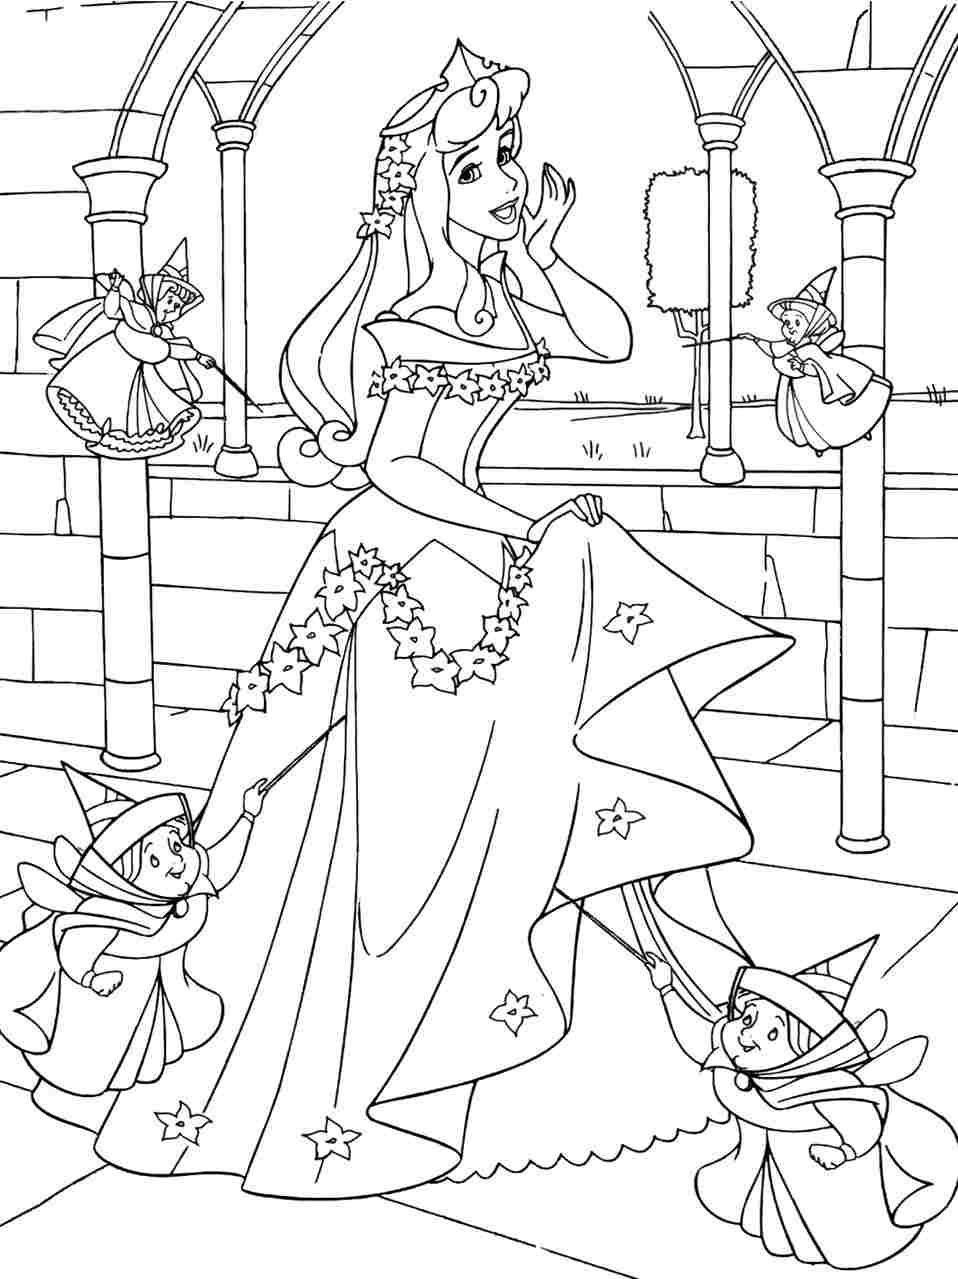 Desenhos De Princesas Para Colorir 31 Desenhos Para Imprimir Gratis Princess Coloring Pages Sleeping Beauty Coloring Pages Princess Aurora Coloring Page